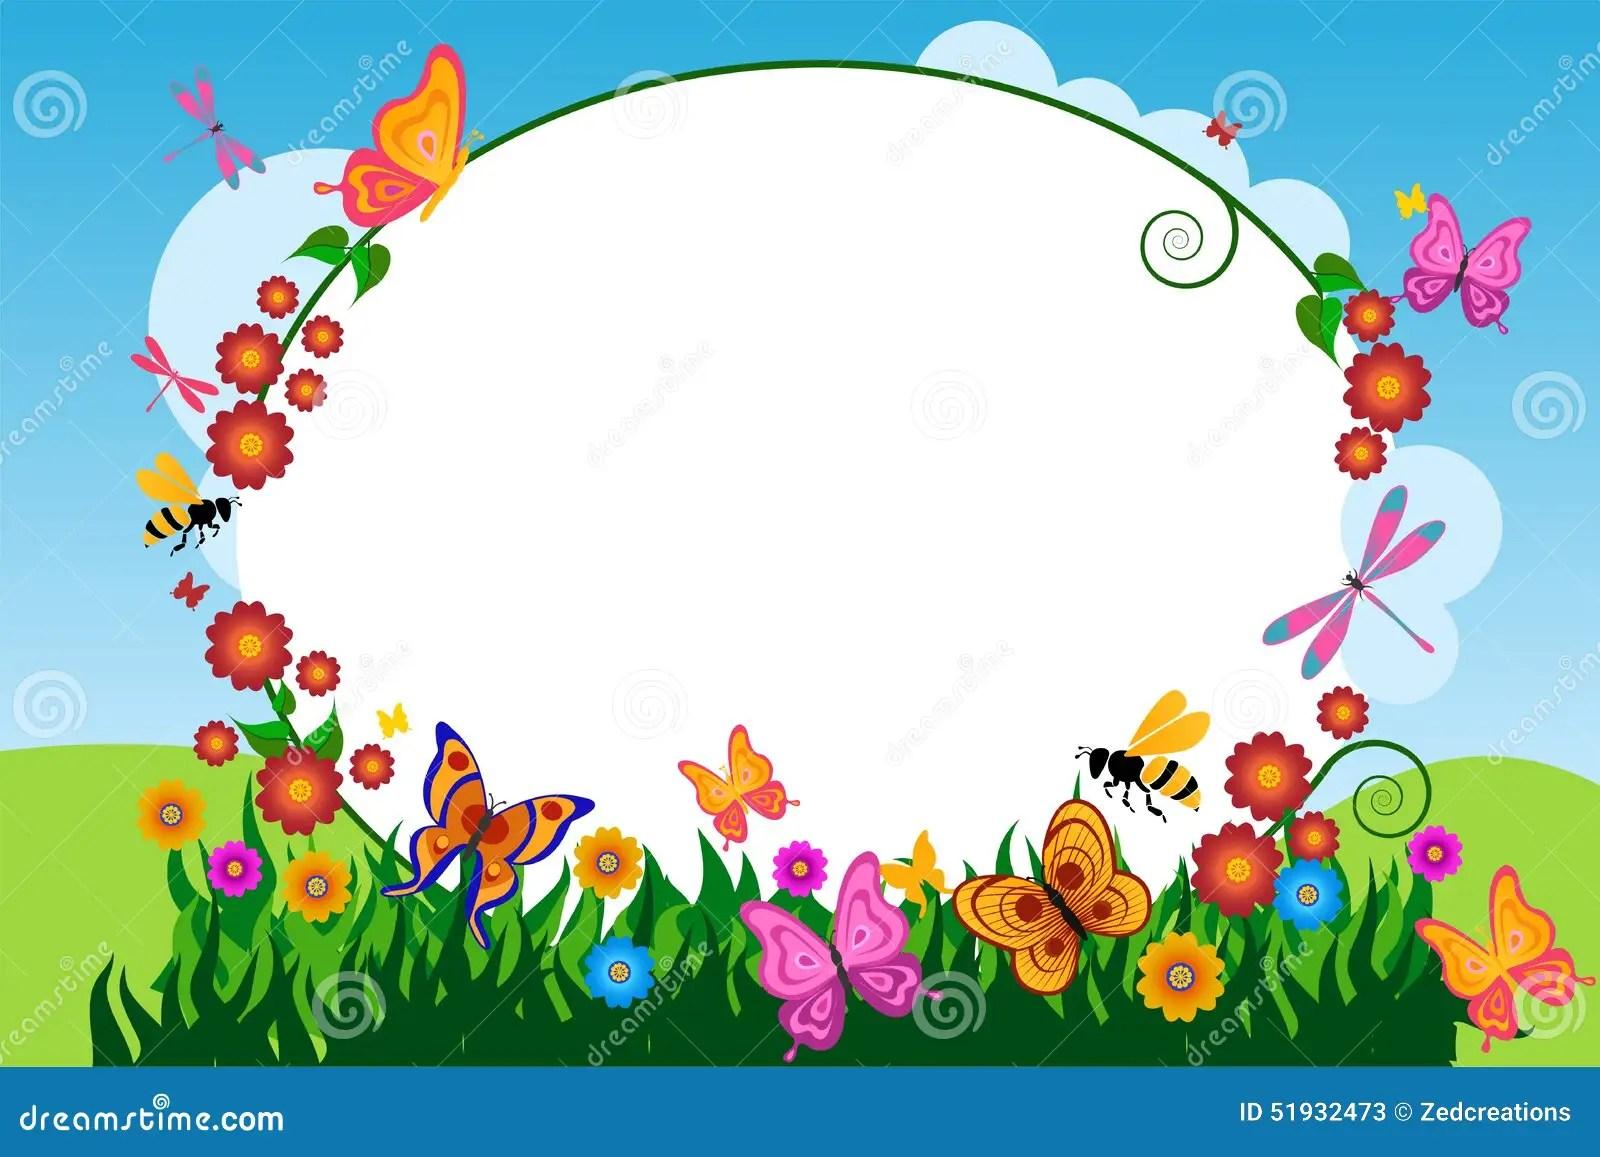 Pink Animal Print Wallpaper Butterfly Flower Frame Background Stock Illustration